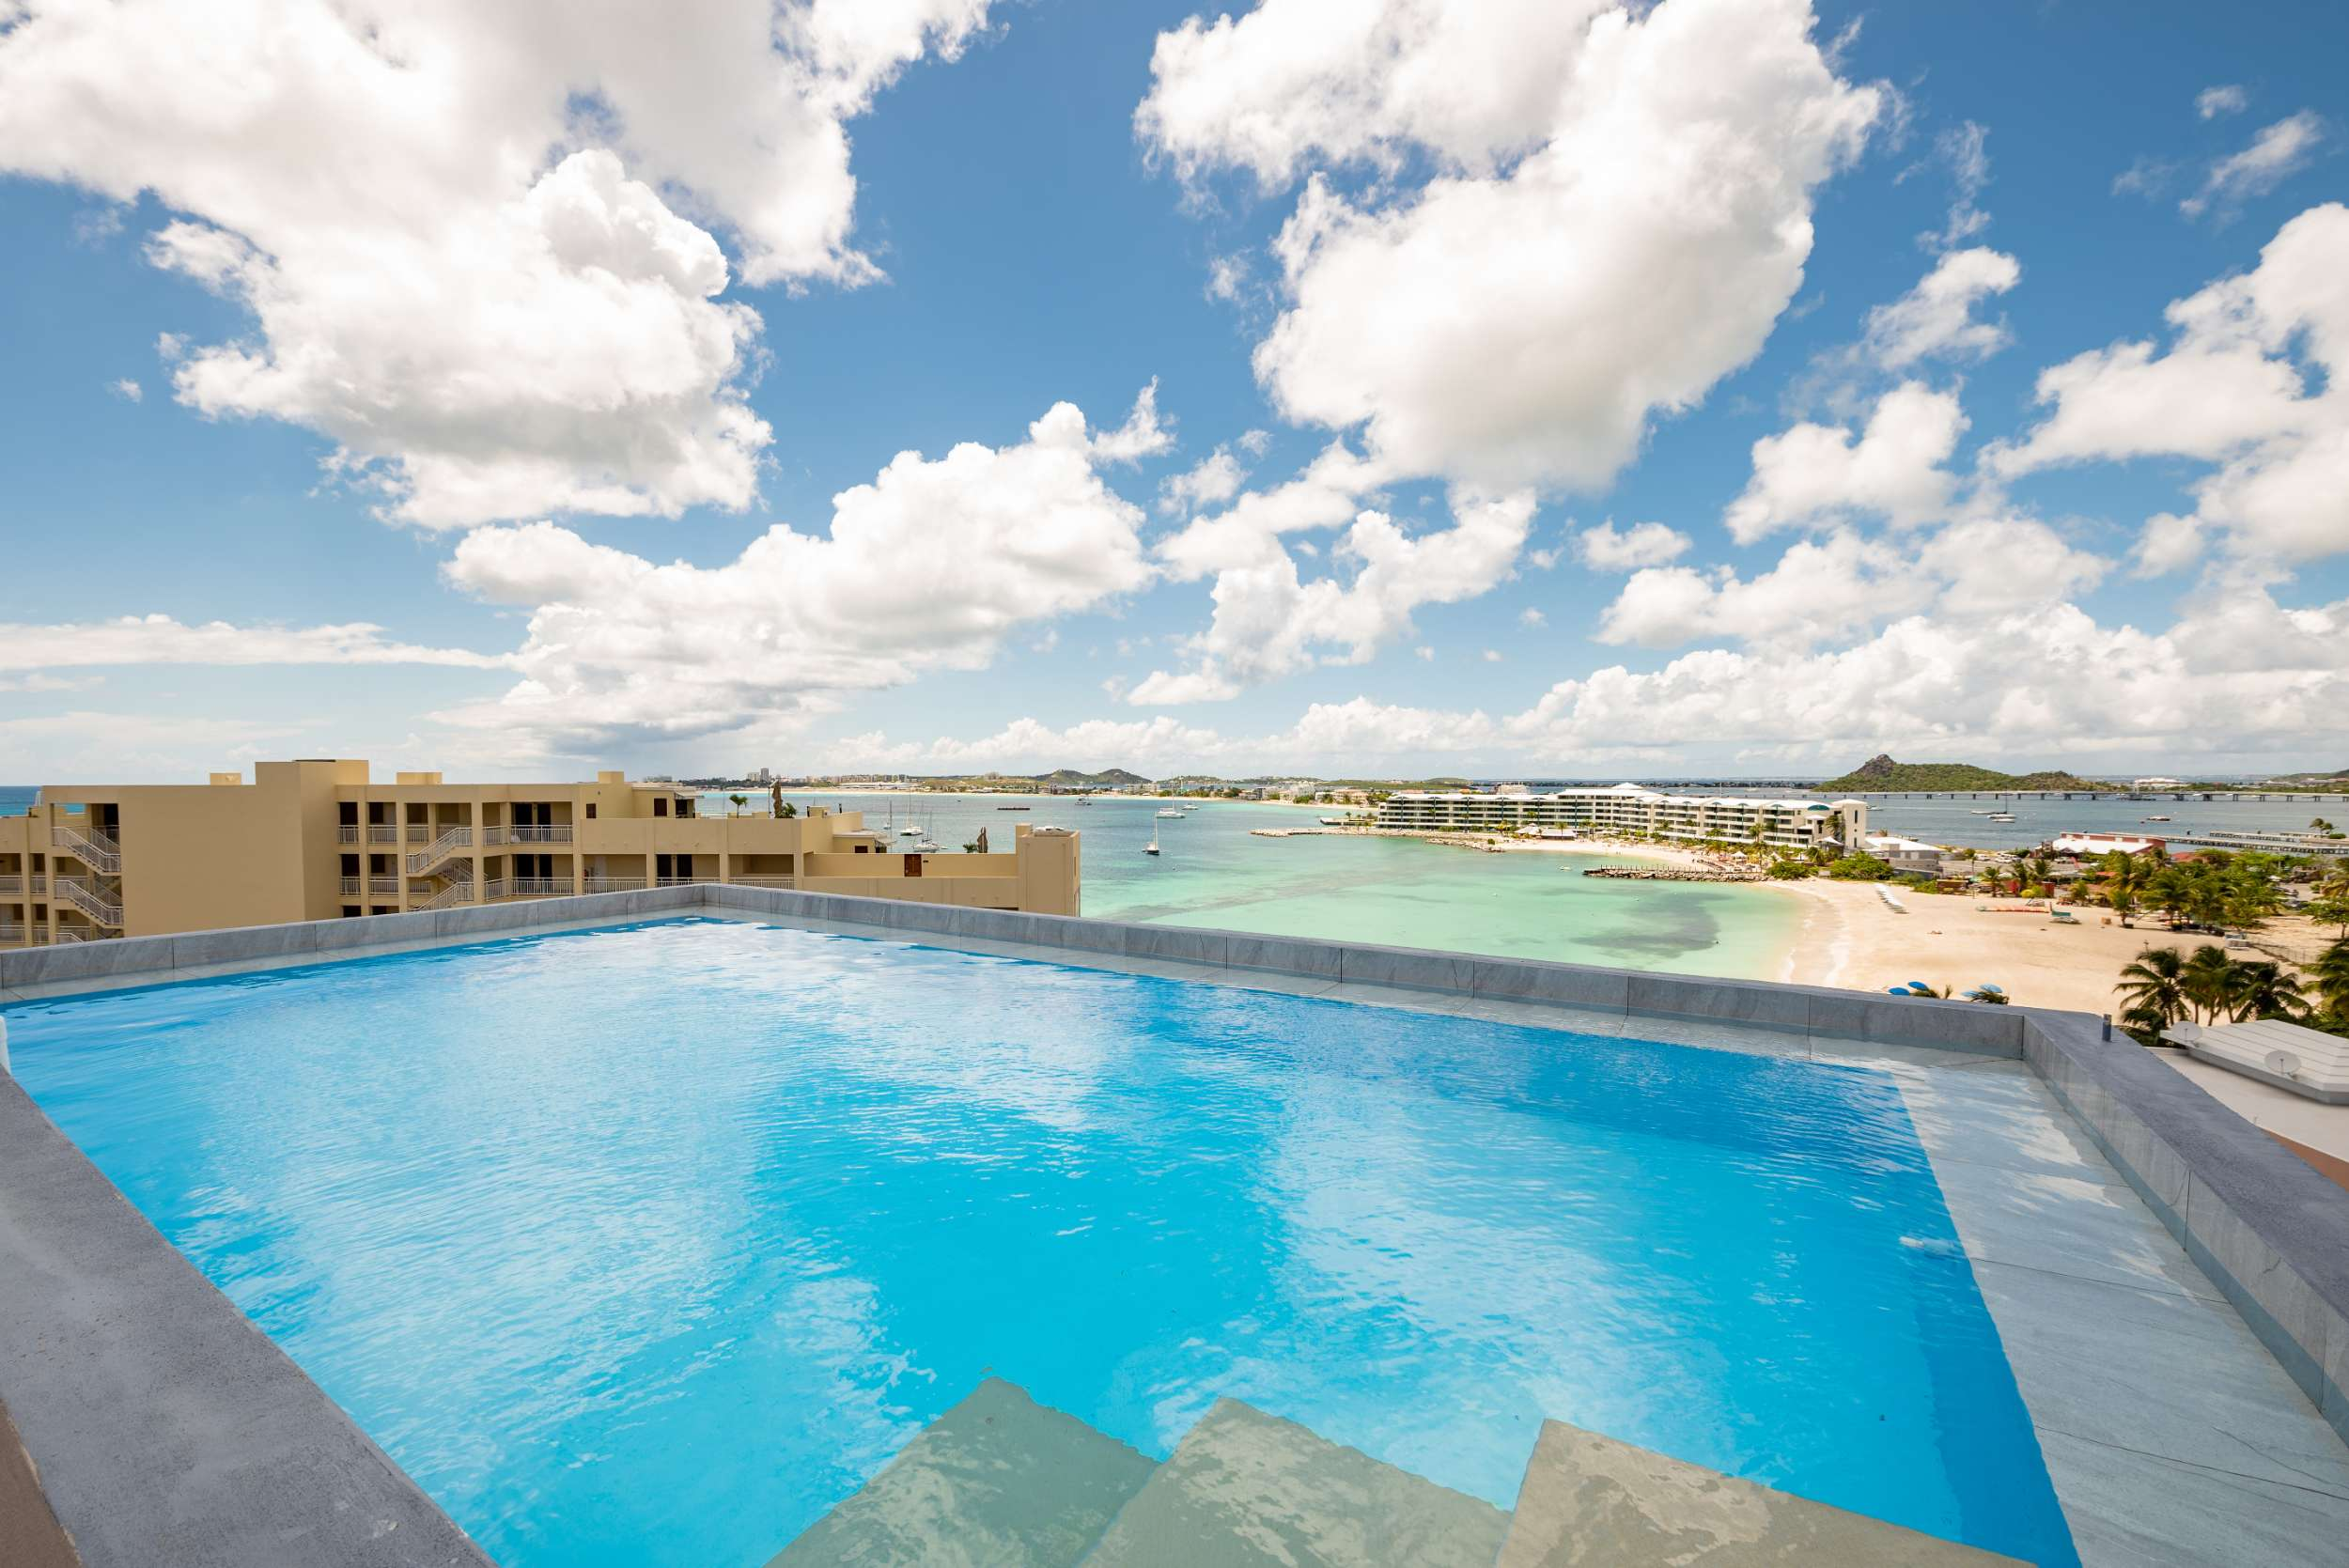 Pelican Key Four Bedroom Luxury Duplex Condos For Sale